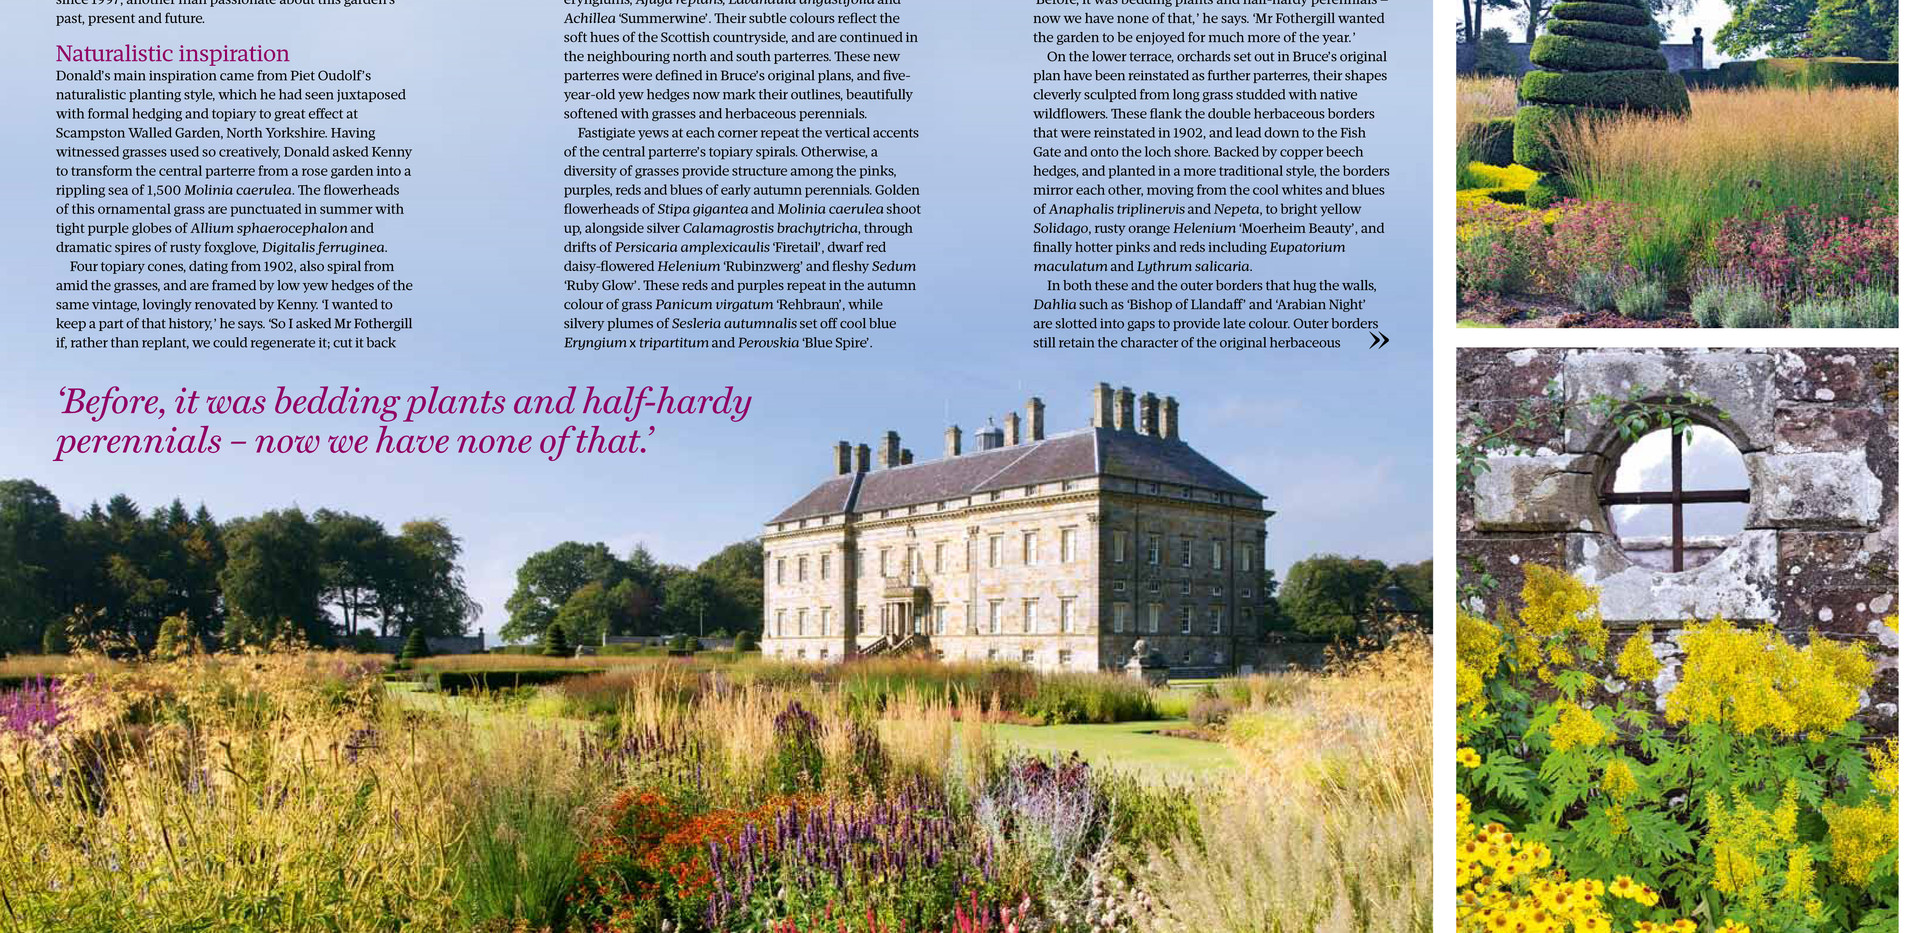 Kinross House Gardens, designed by Alistair Baldwin, The Garden, RHS Magazine September 2016, Page 2